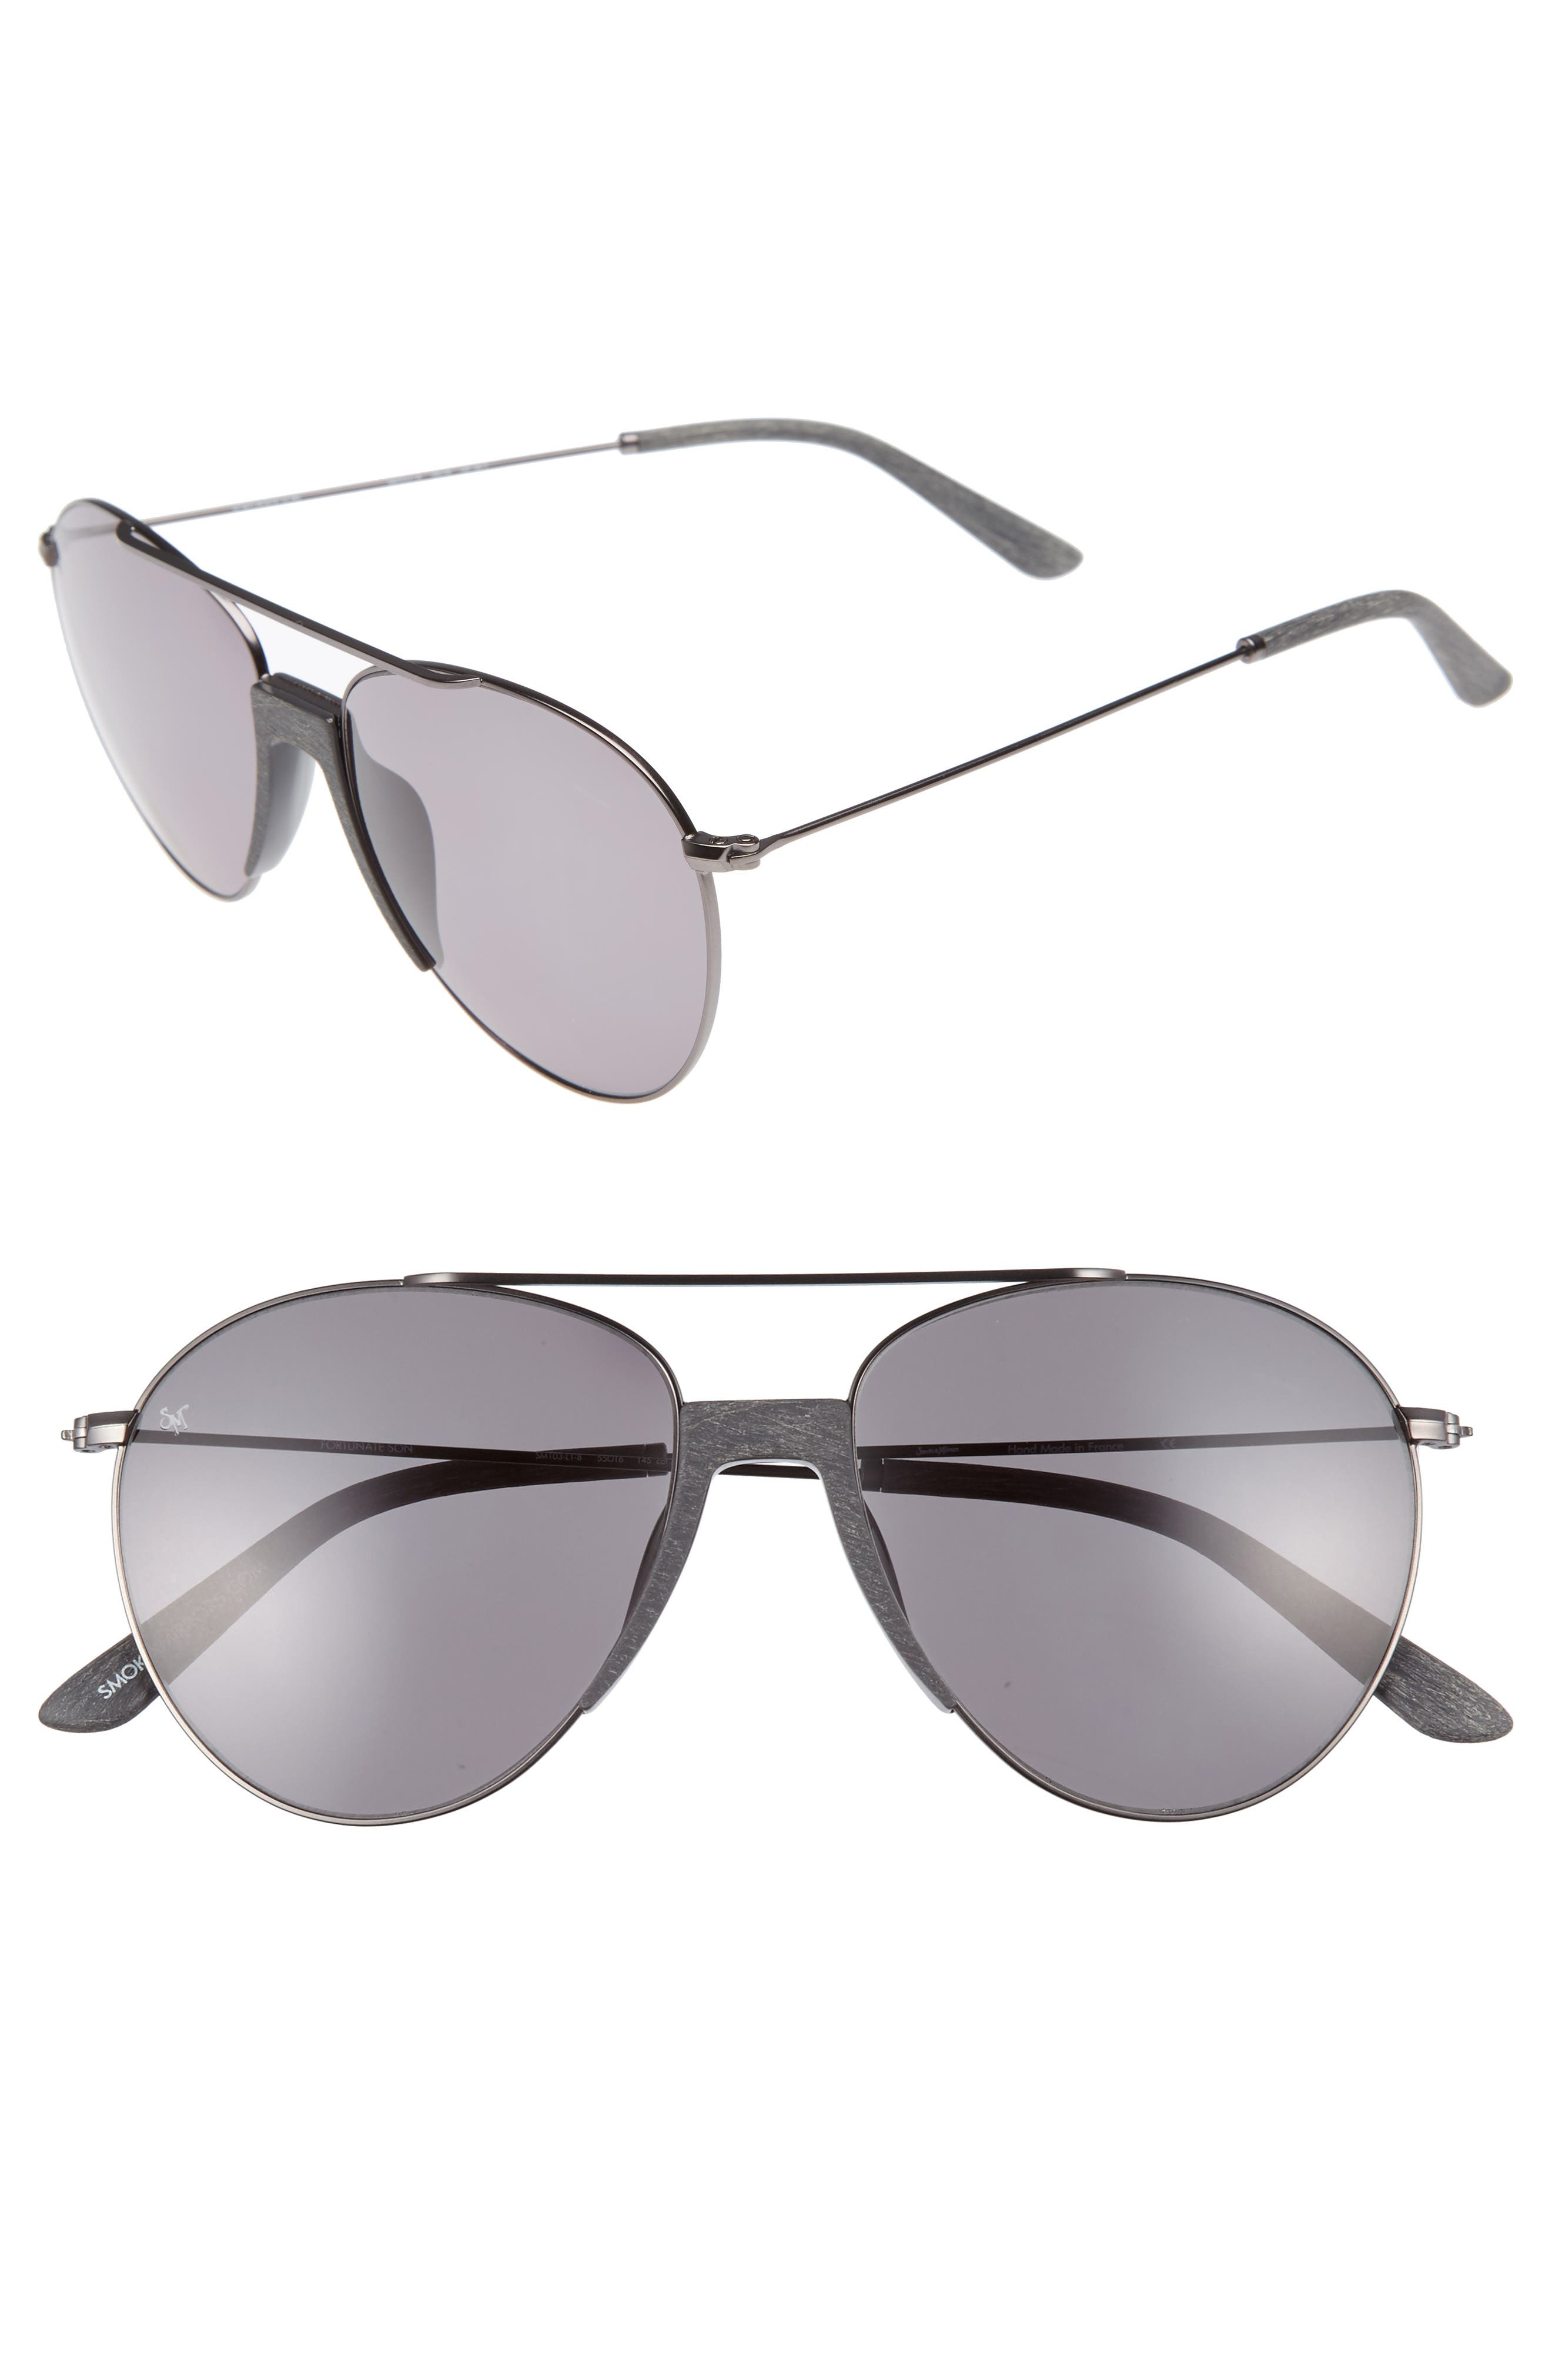 Fortunate Son 55mm Gradient Lens Aviator Sunglasses,                         Main,                         color, Grey Wood/ Light Green